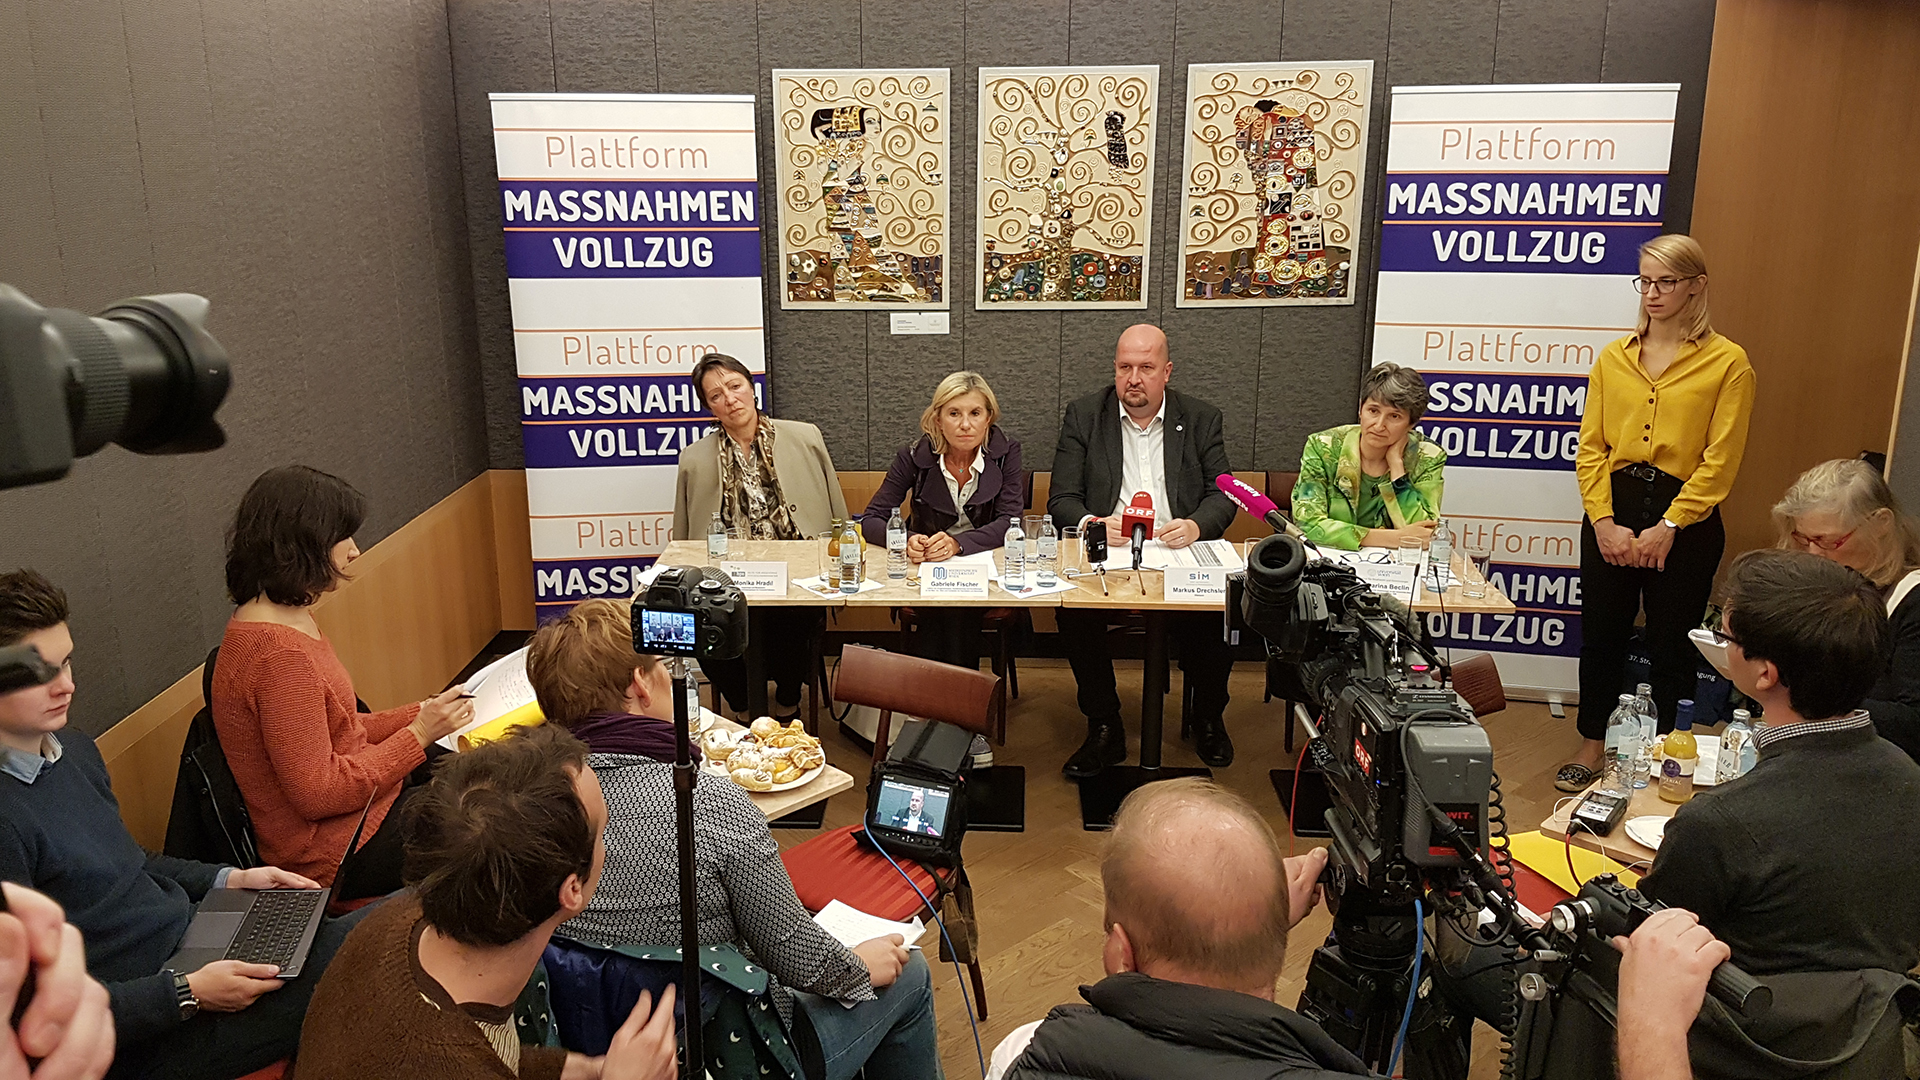 Pressekonferenz Maßnahmenvollzug mit Markus Drechsler, Monika Hradil, Gabriele Fischer, Katharina Beclin